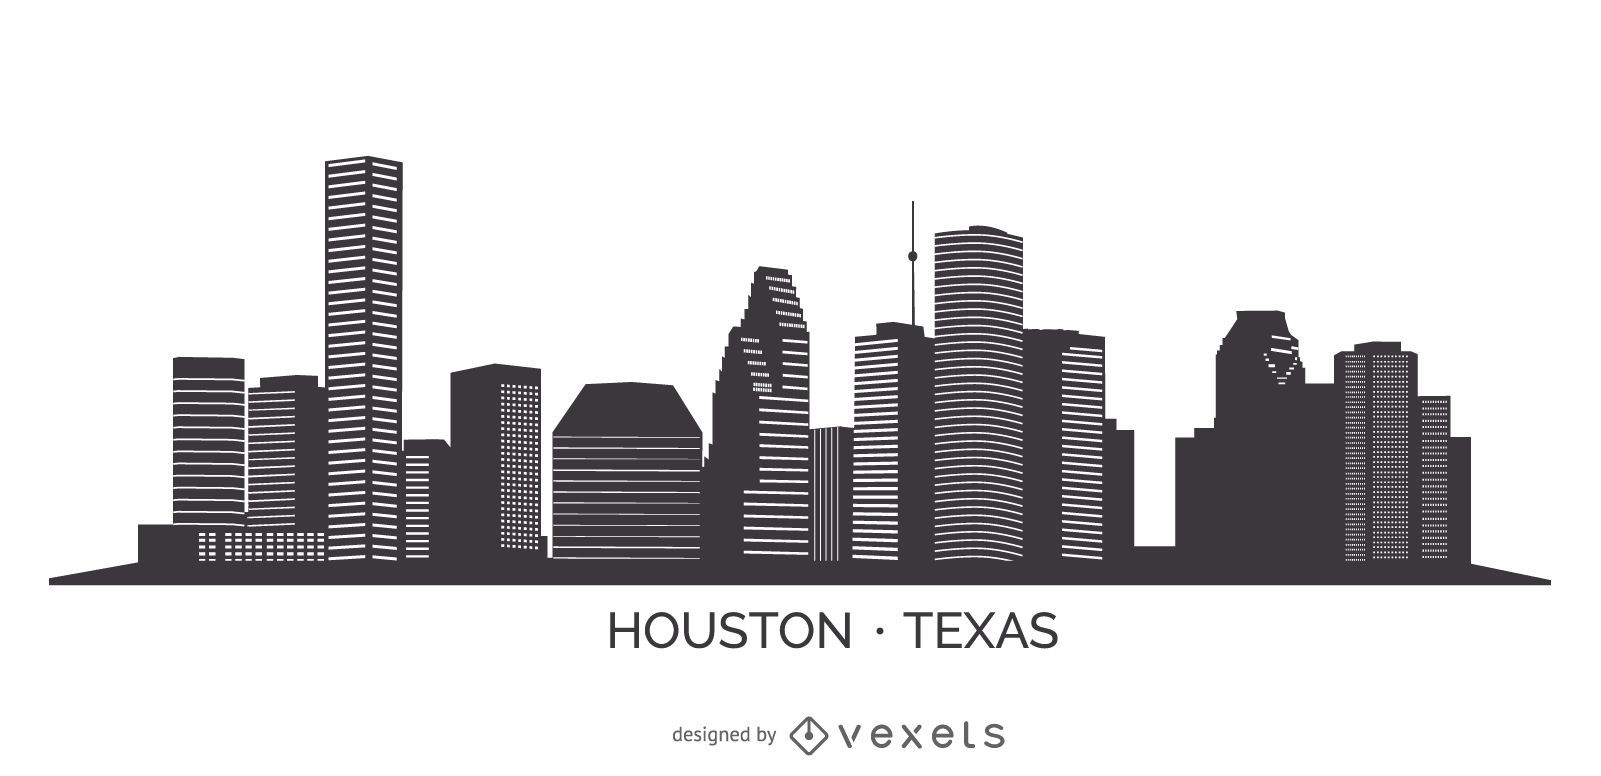 Houston Skyline Silhouette Houston Skyline Skyline Silhouette Skyline Drawing